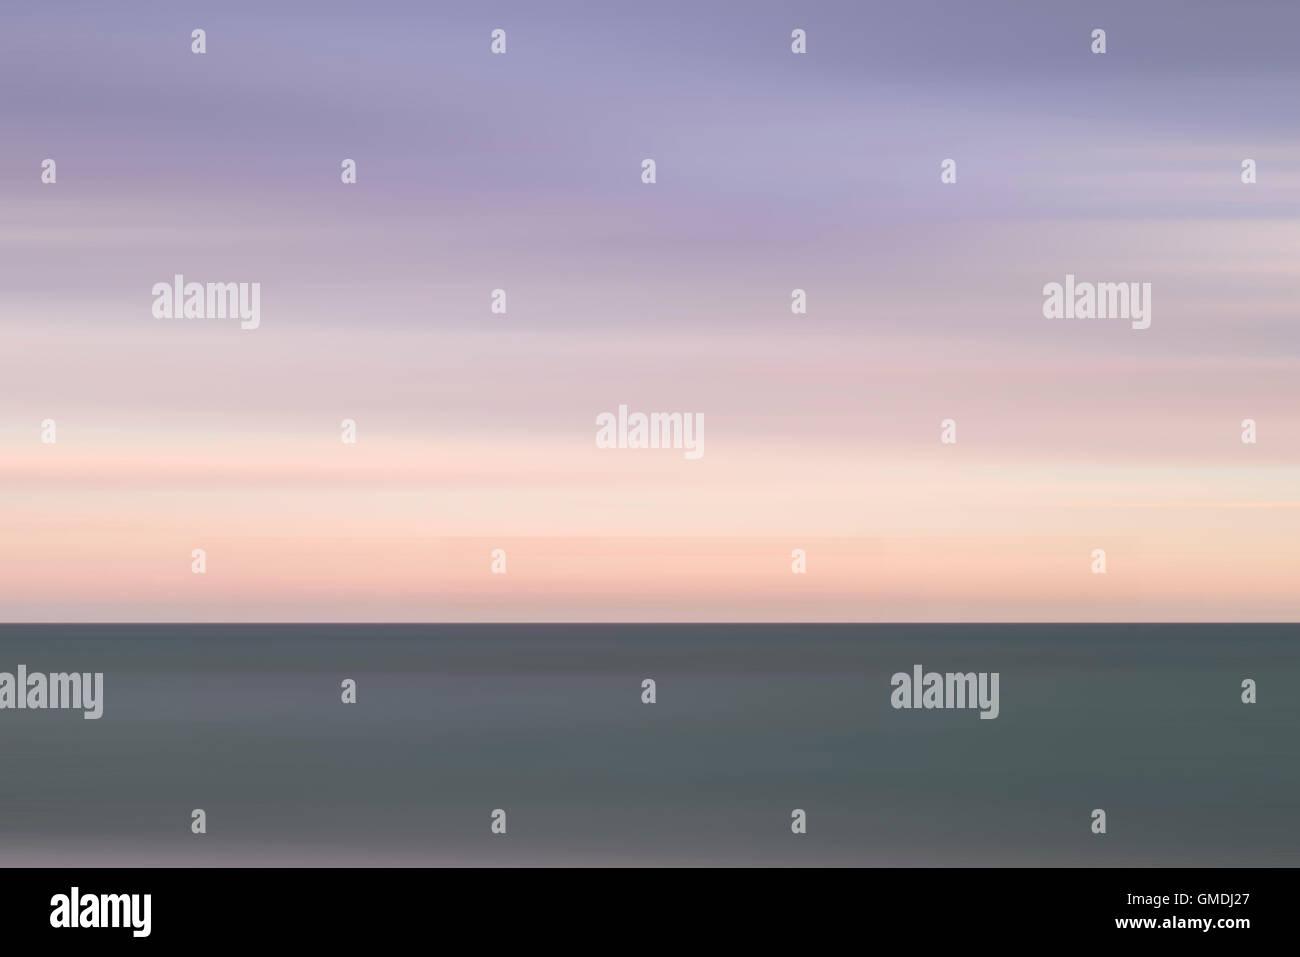 Beautiful vibrant conceptual image of peaceful sea at sunset - Stock Image